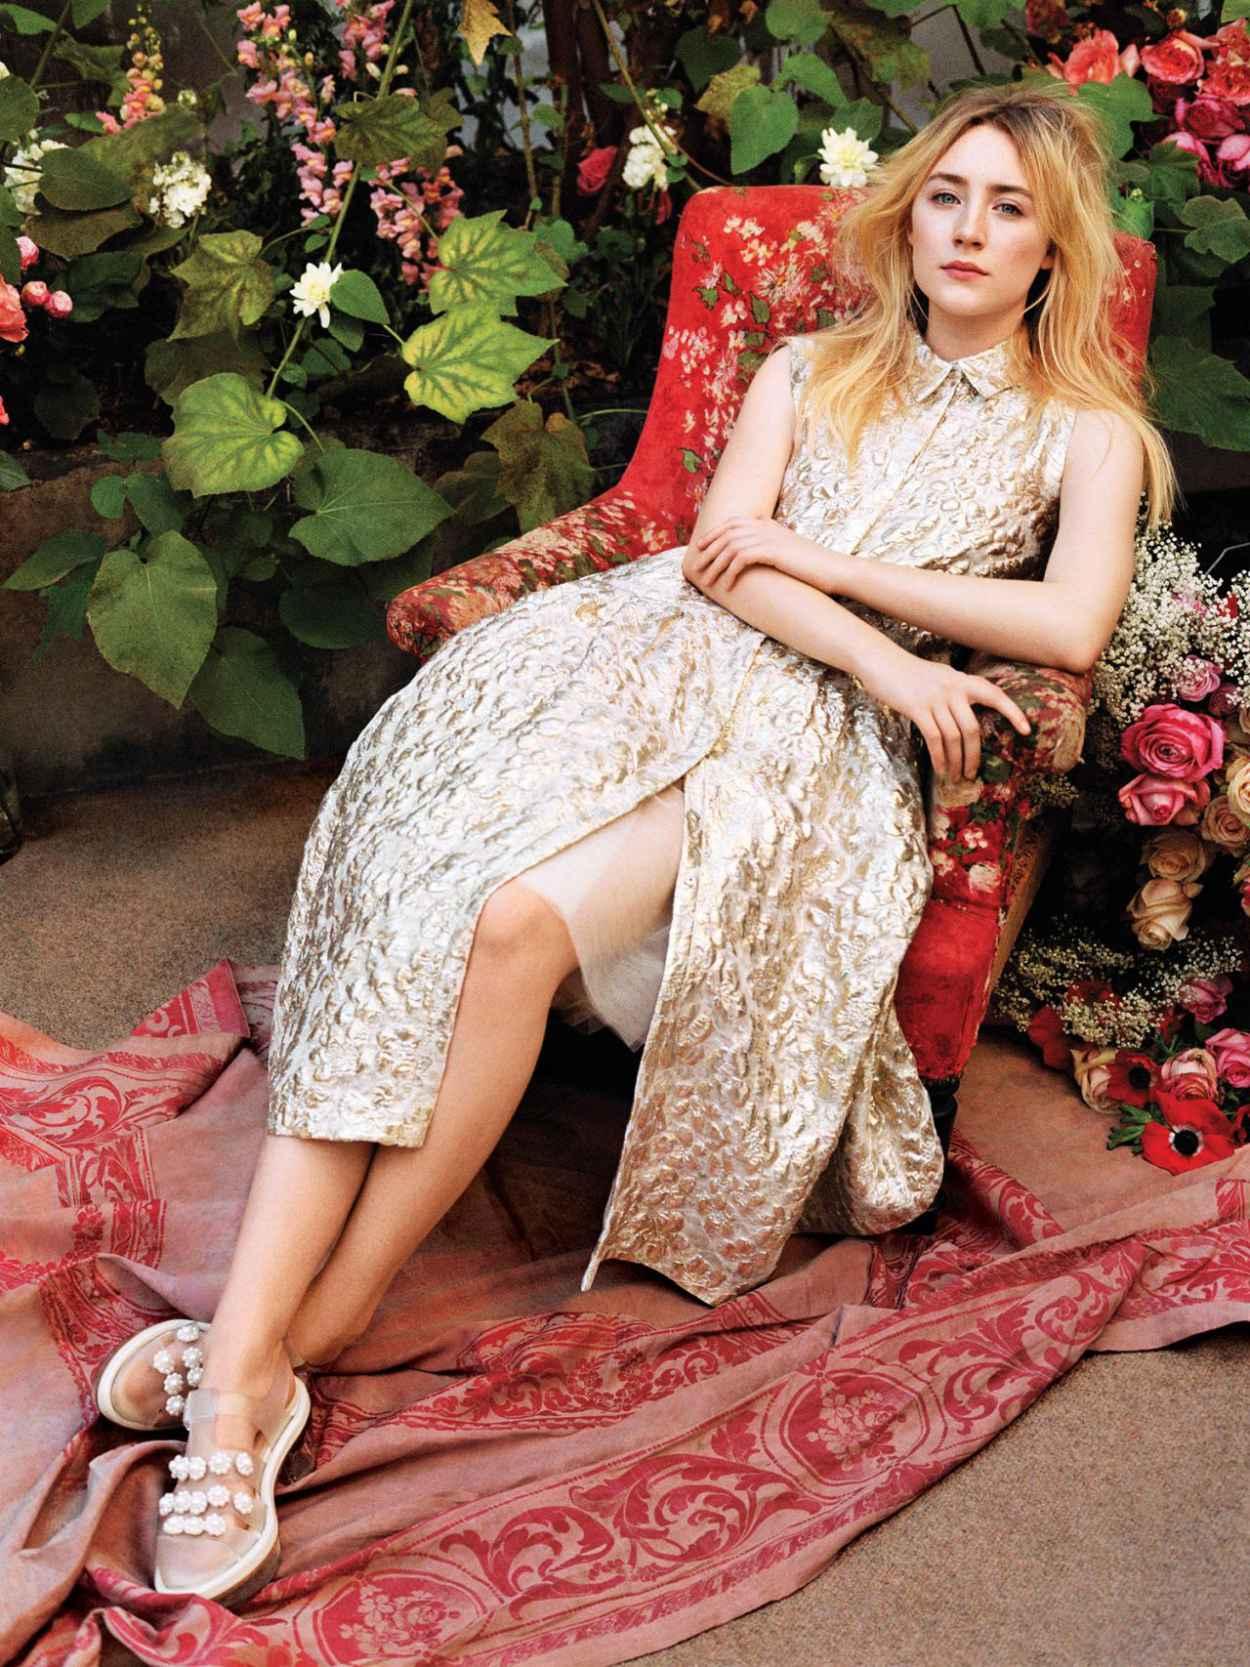 Saorise Ronan - Angelo Pennetta Photoshoot for Vogue Magazine - March 2015-1